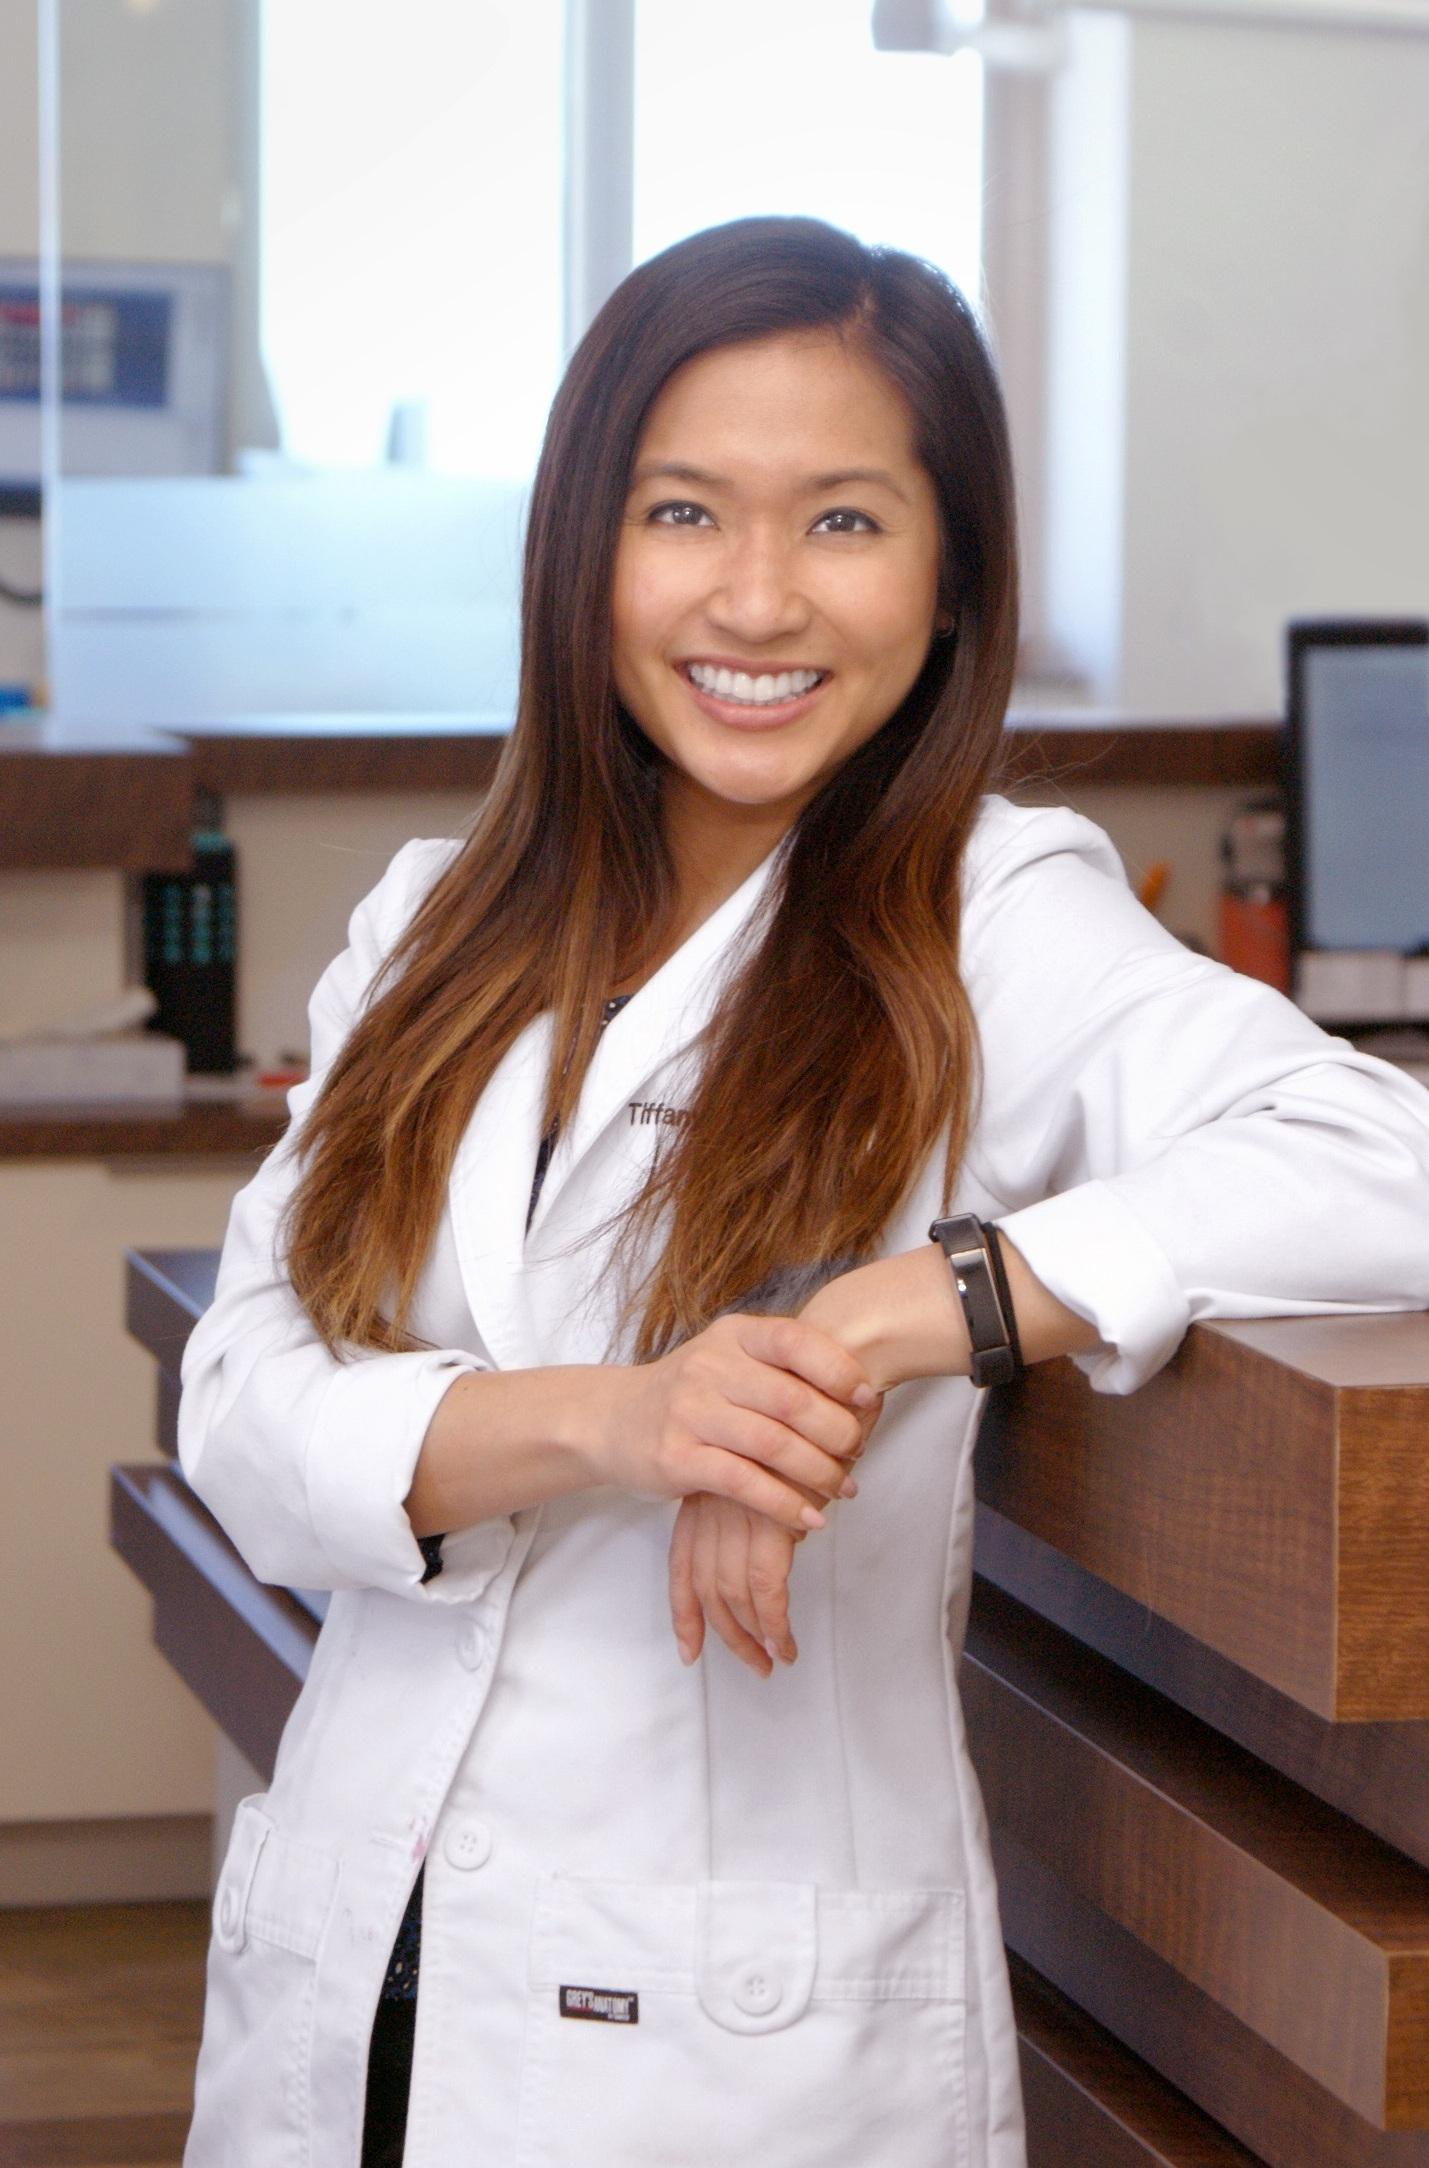 Dr. Tiffany Nguyen - Dental Associate